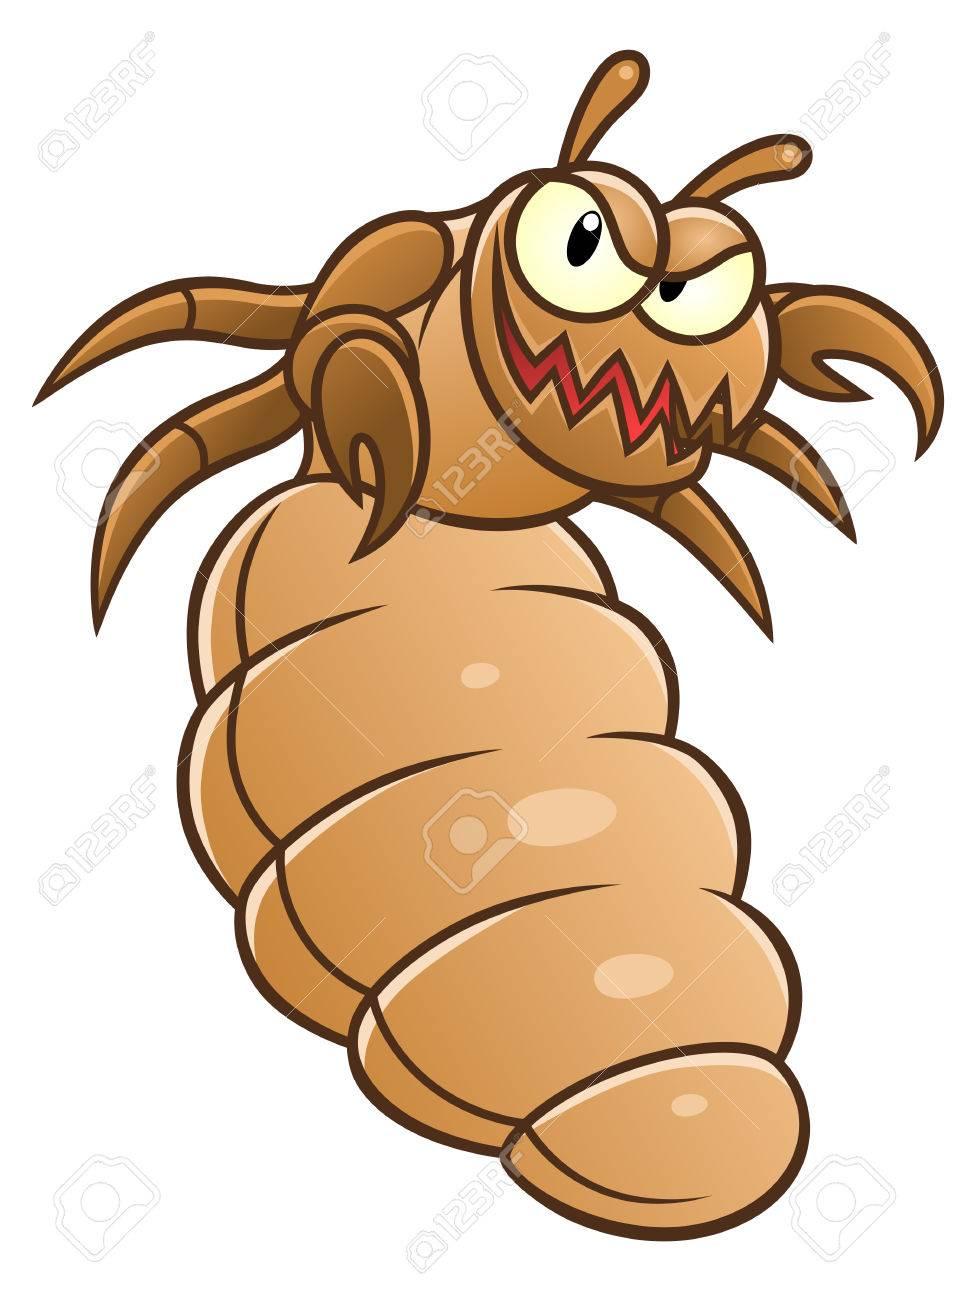 Funny louse.